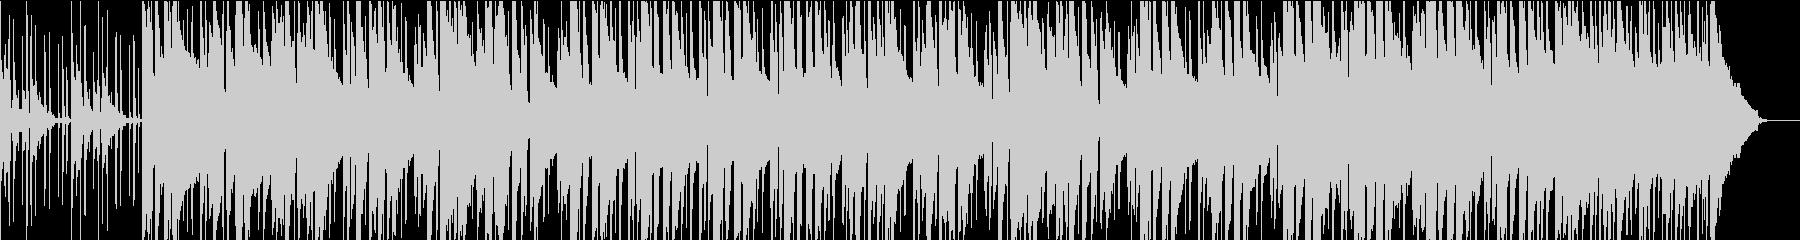 AIによるリマスターバージョンの未再生の波形